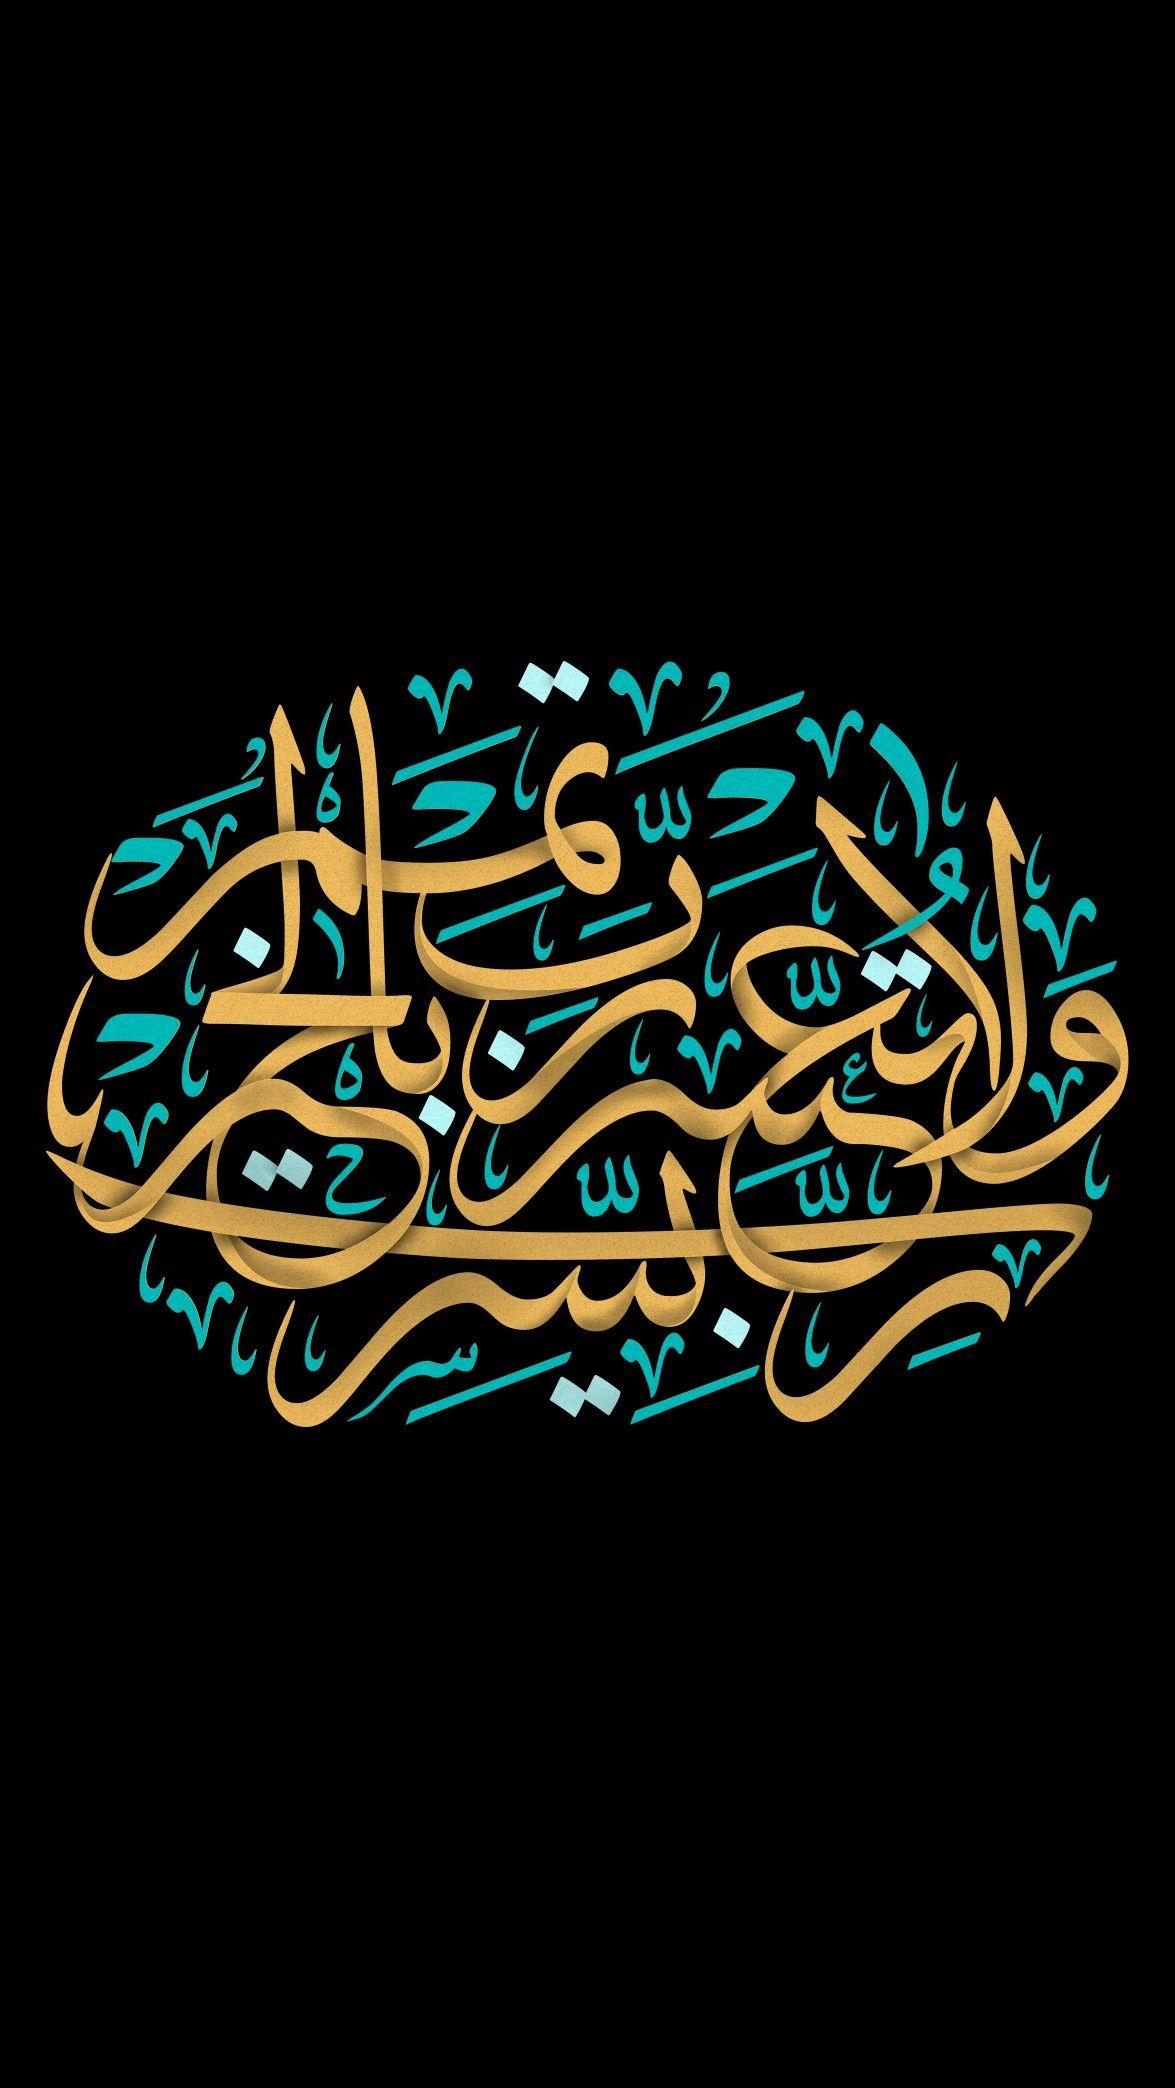 رب يسر ولا تعسر رب تمم بالخير Islamic Calligraphy Islamic Art Calligraphy Islamic Art